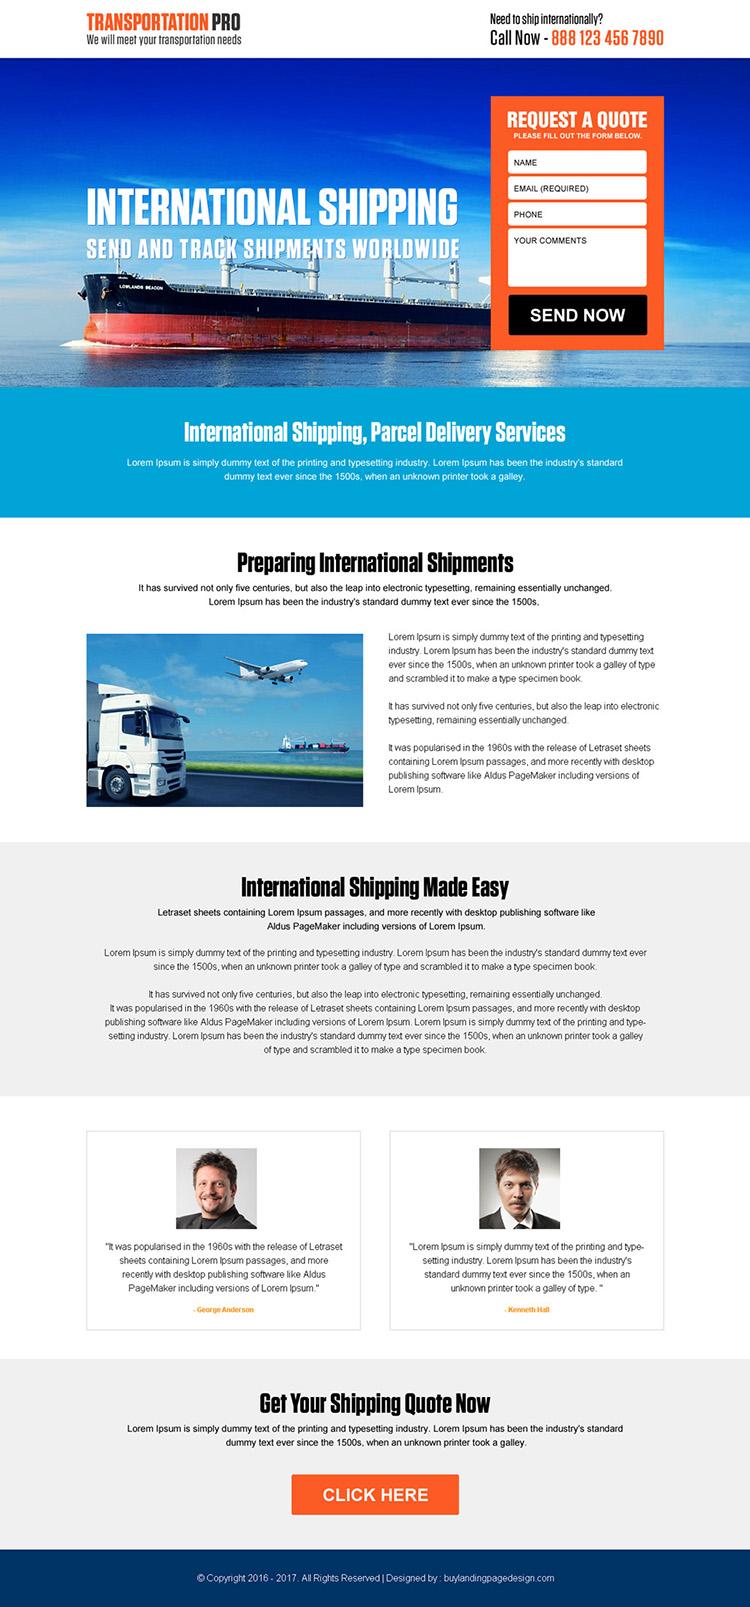 responsive international transportation service landing page